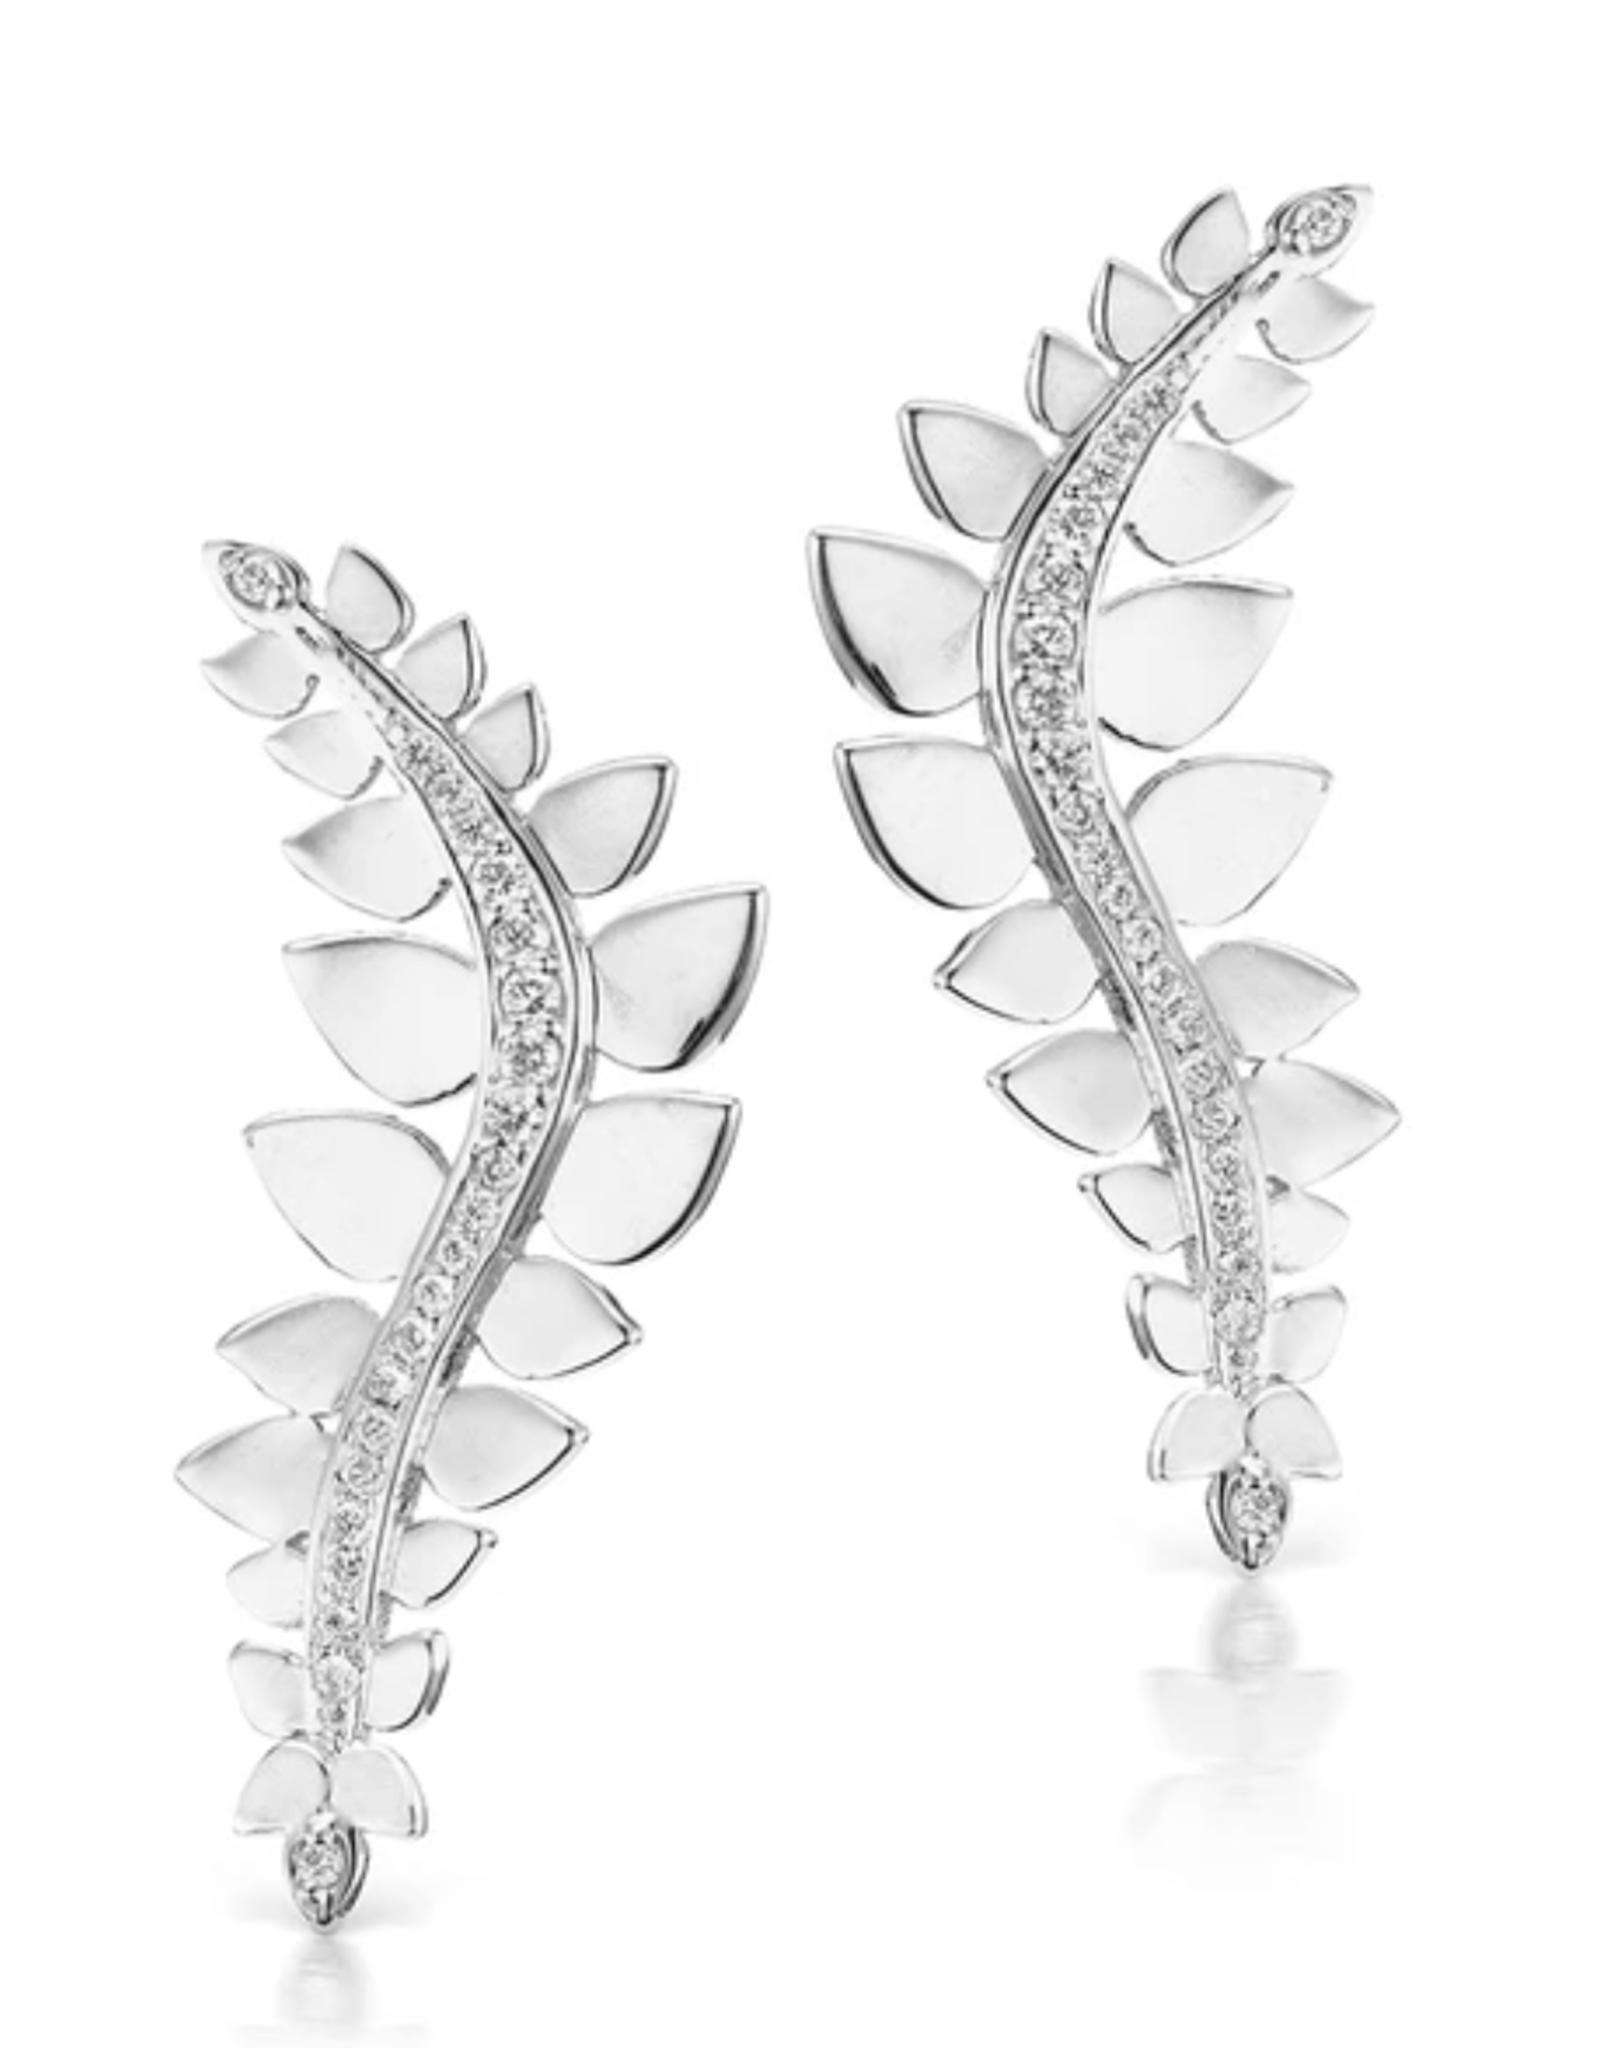 KBH Jewels Leaf Climber Earrings